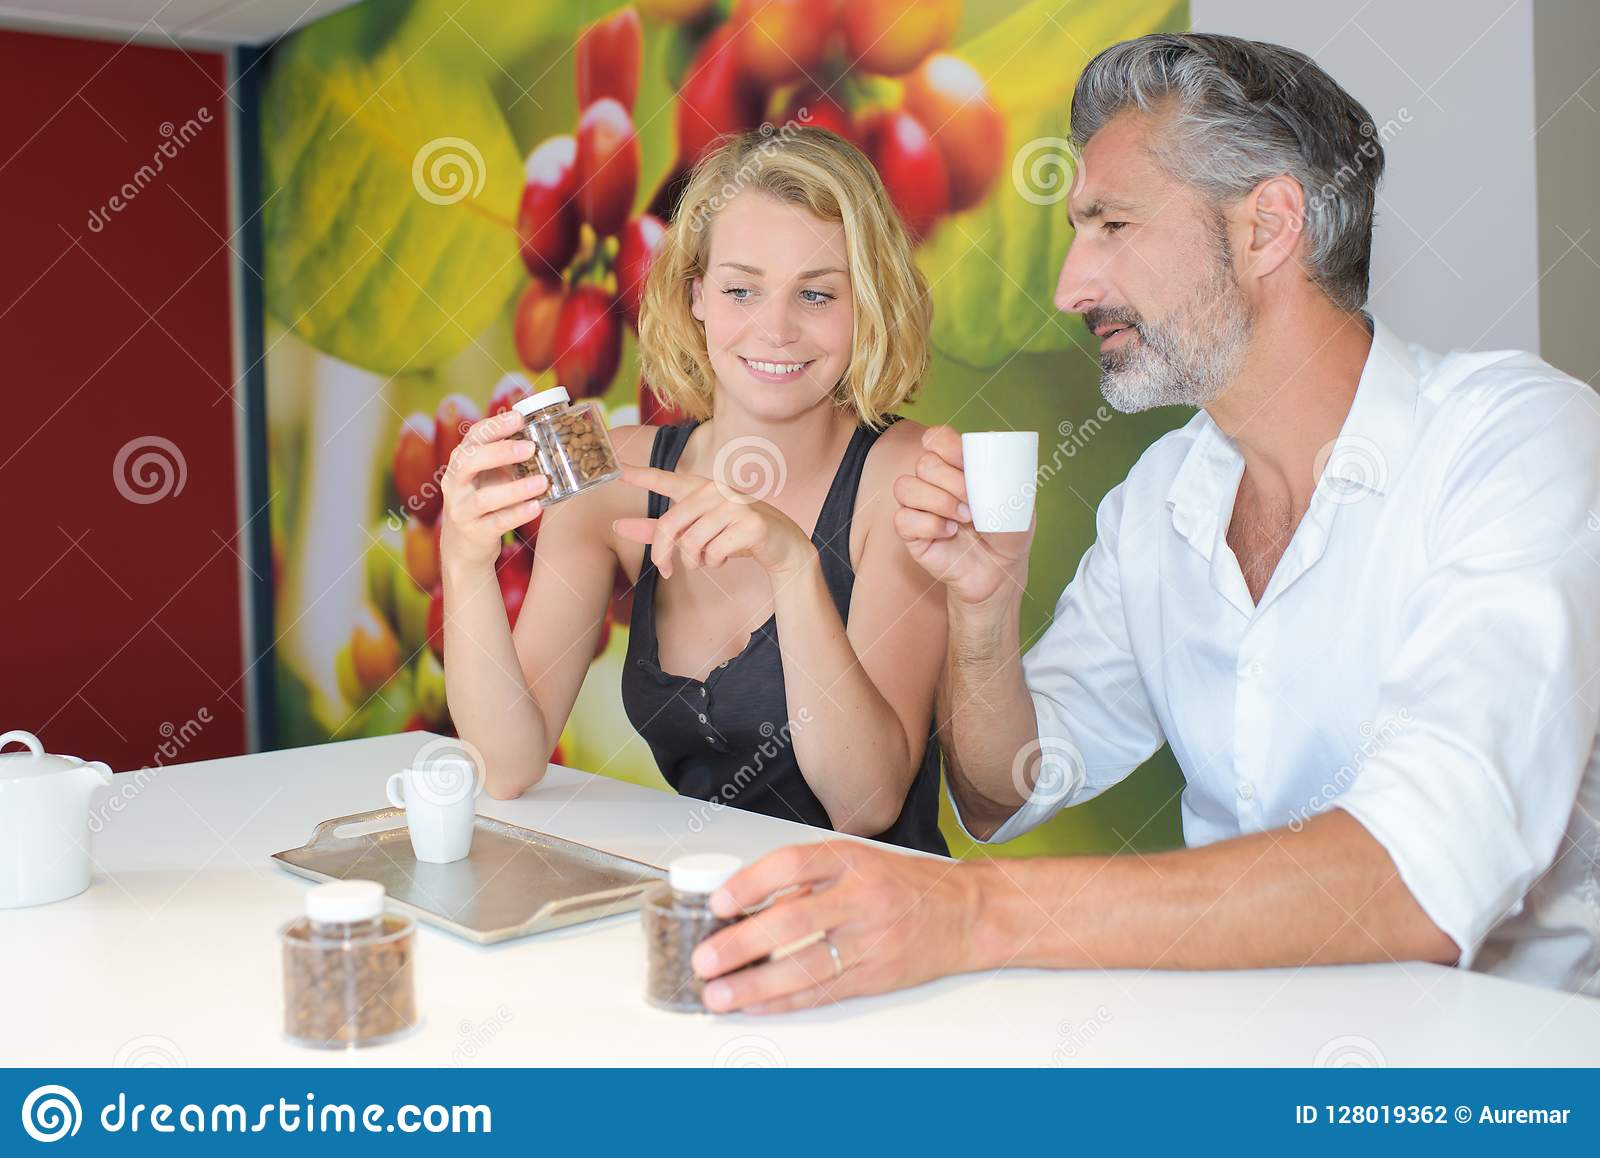 Man and lady testing coffee